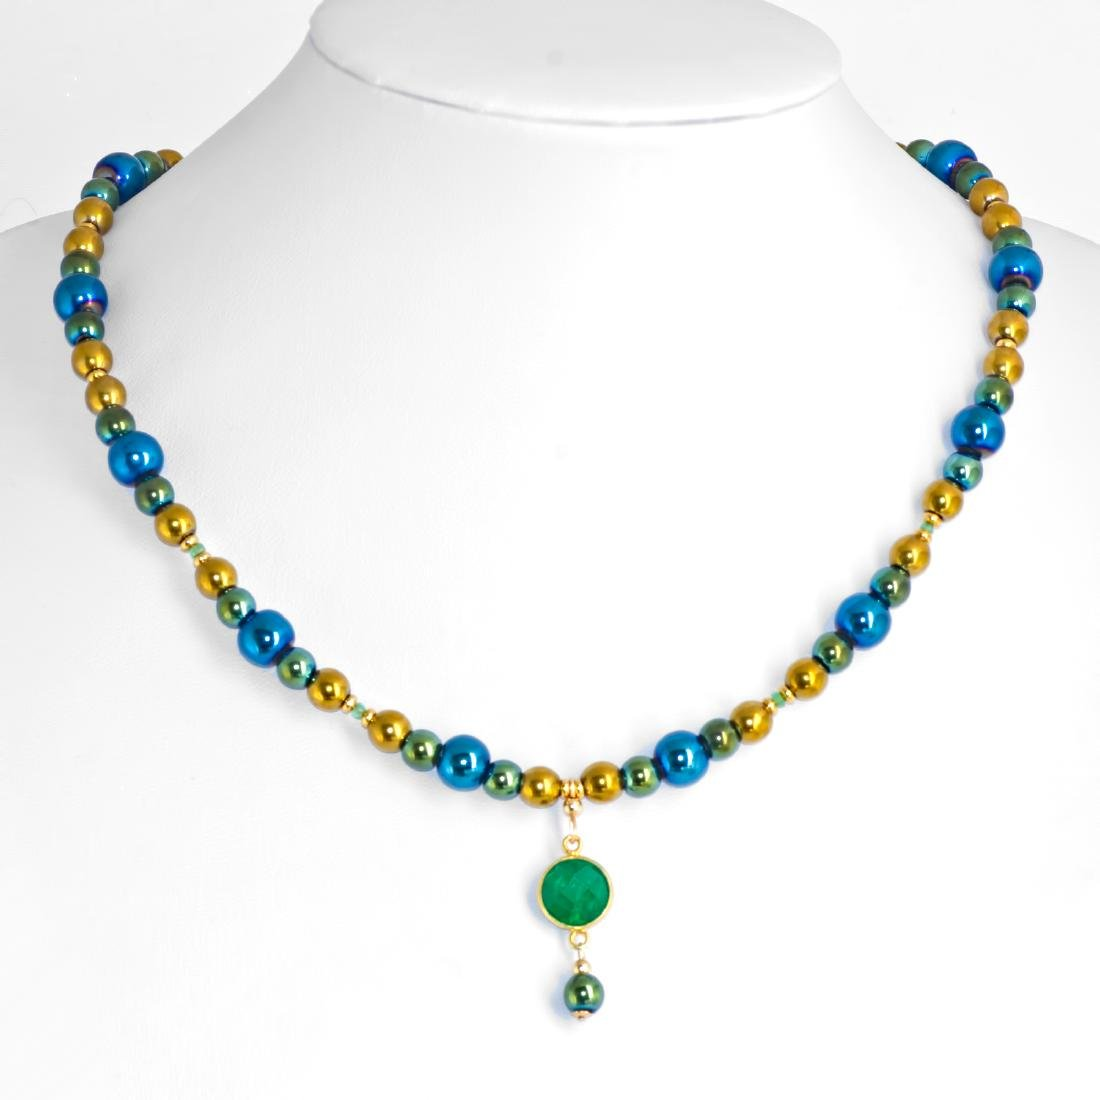 Mirror Emerald necklace with Emerald pendant 4 carat